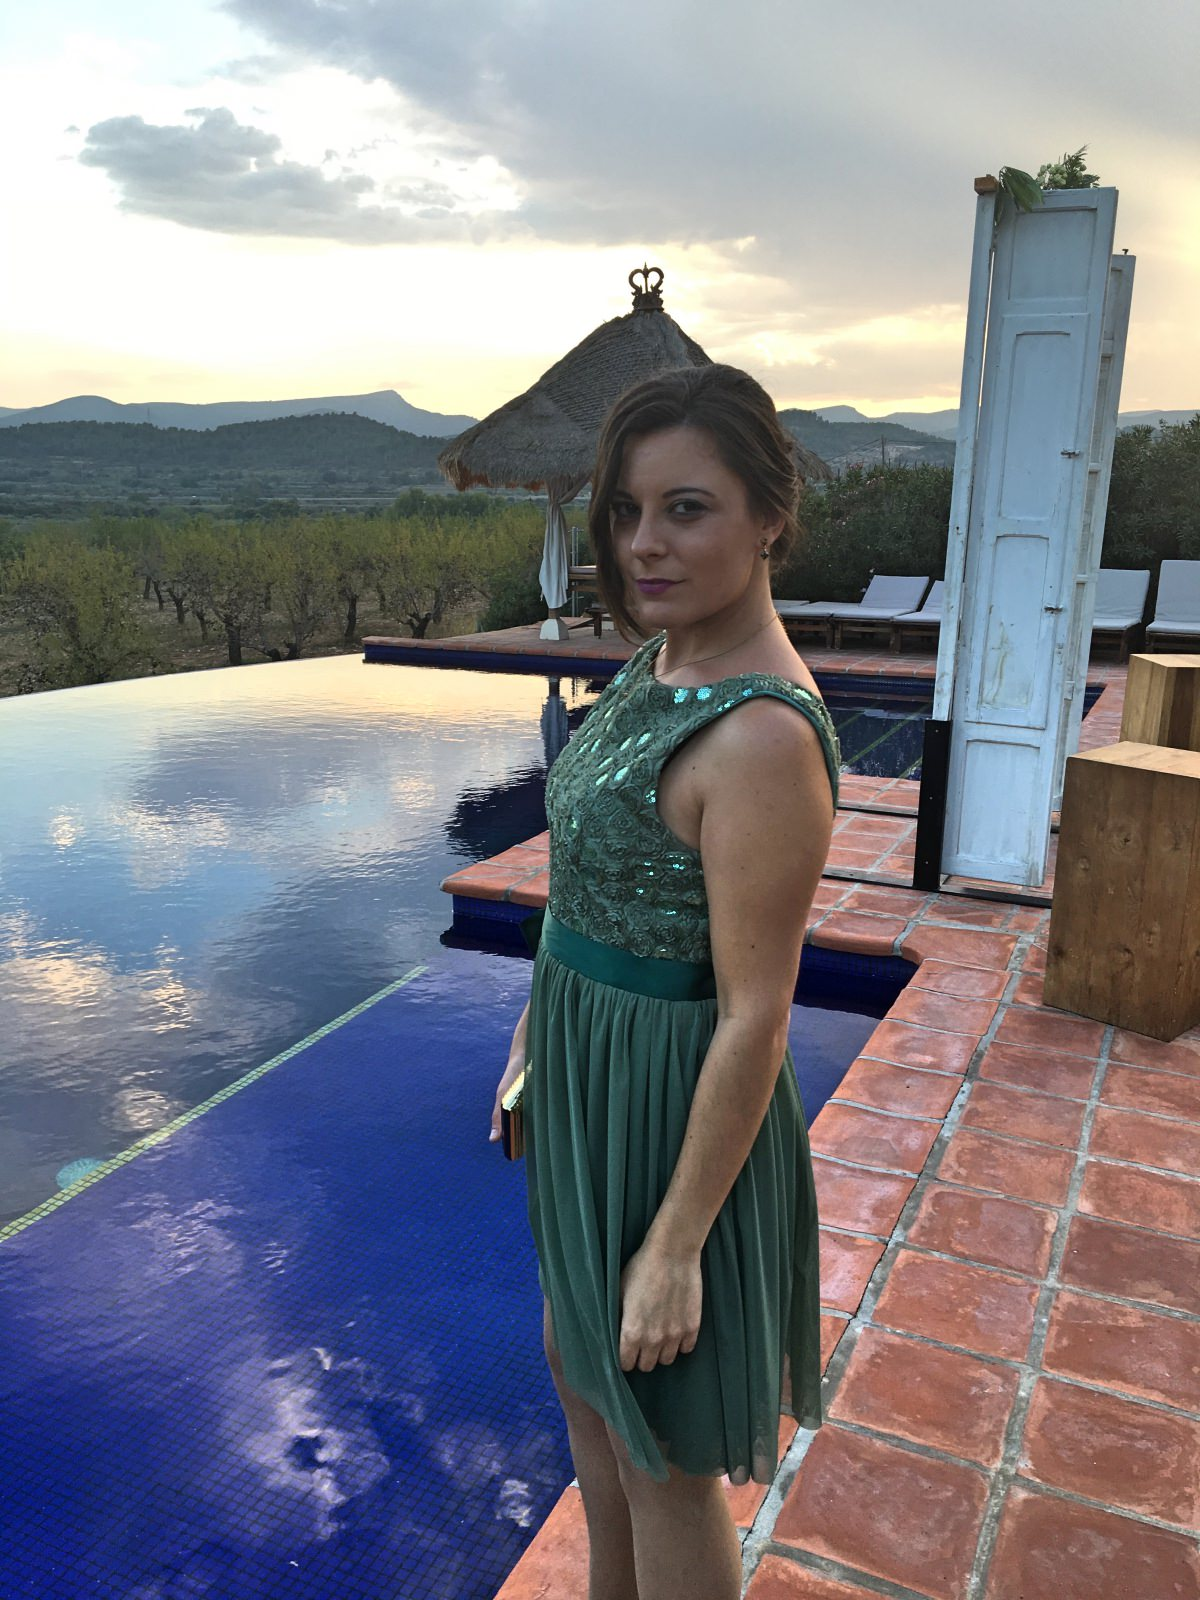 look_invitadadeboda_fashionblogger_mivestidoazul-com_influencer_blogdemoda_castellonmg_1643